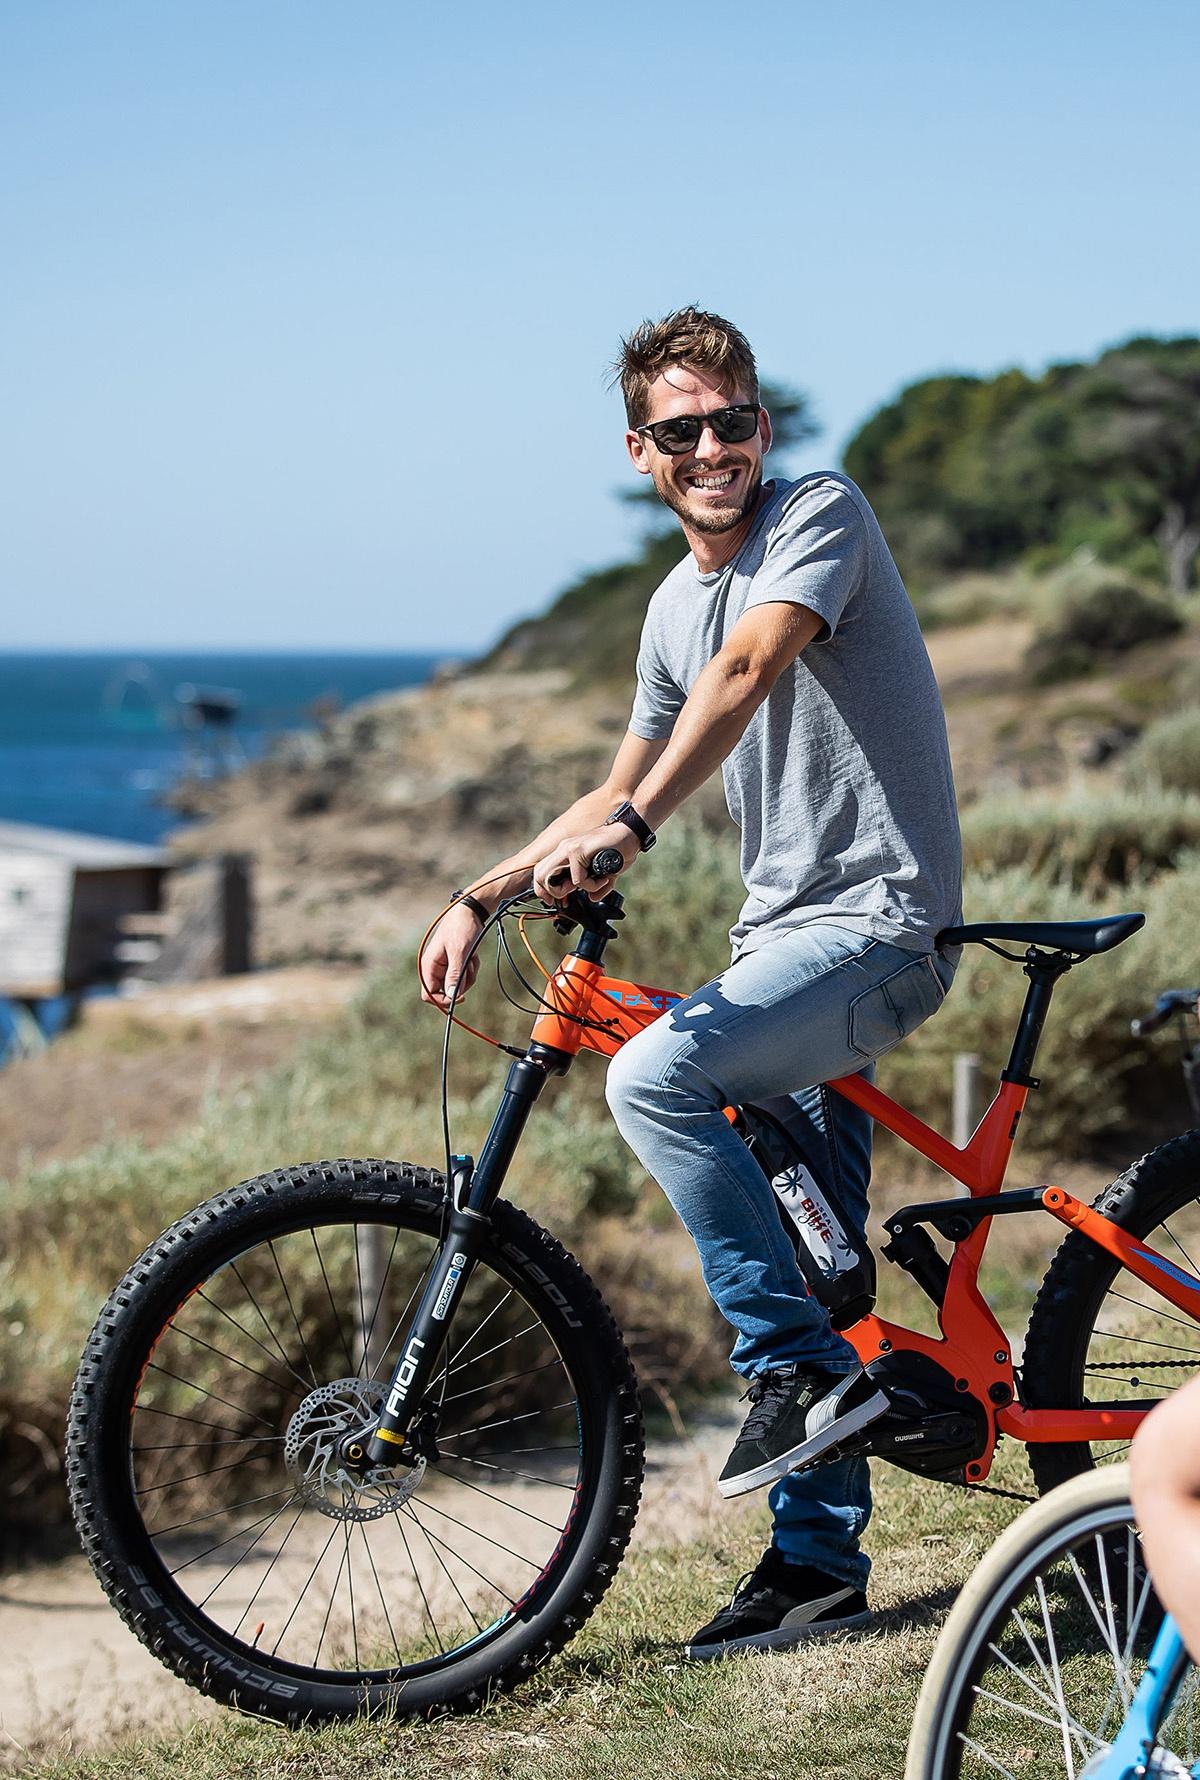 sea bike and sun pornic